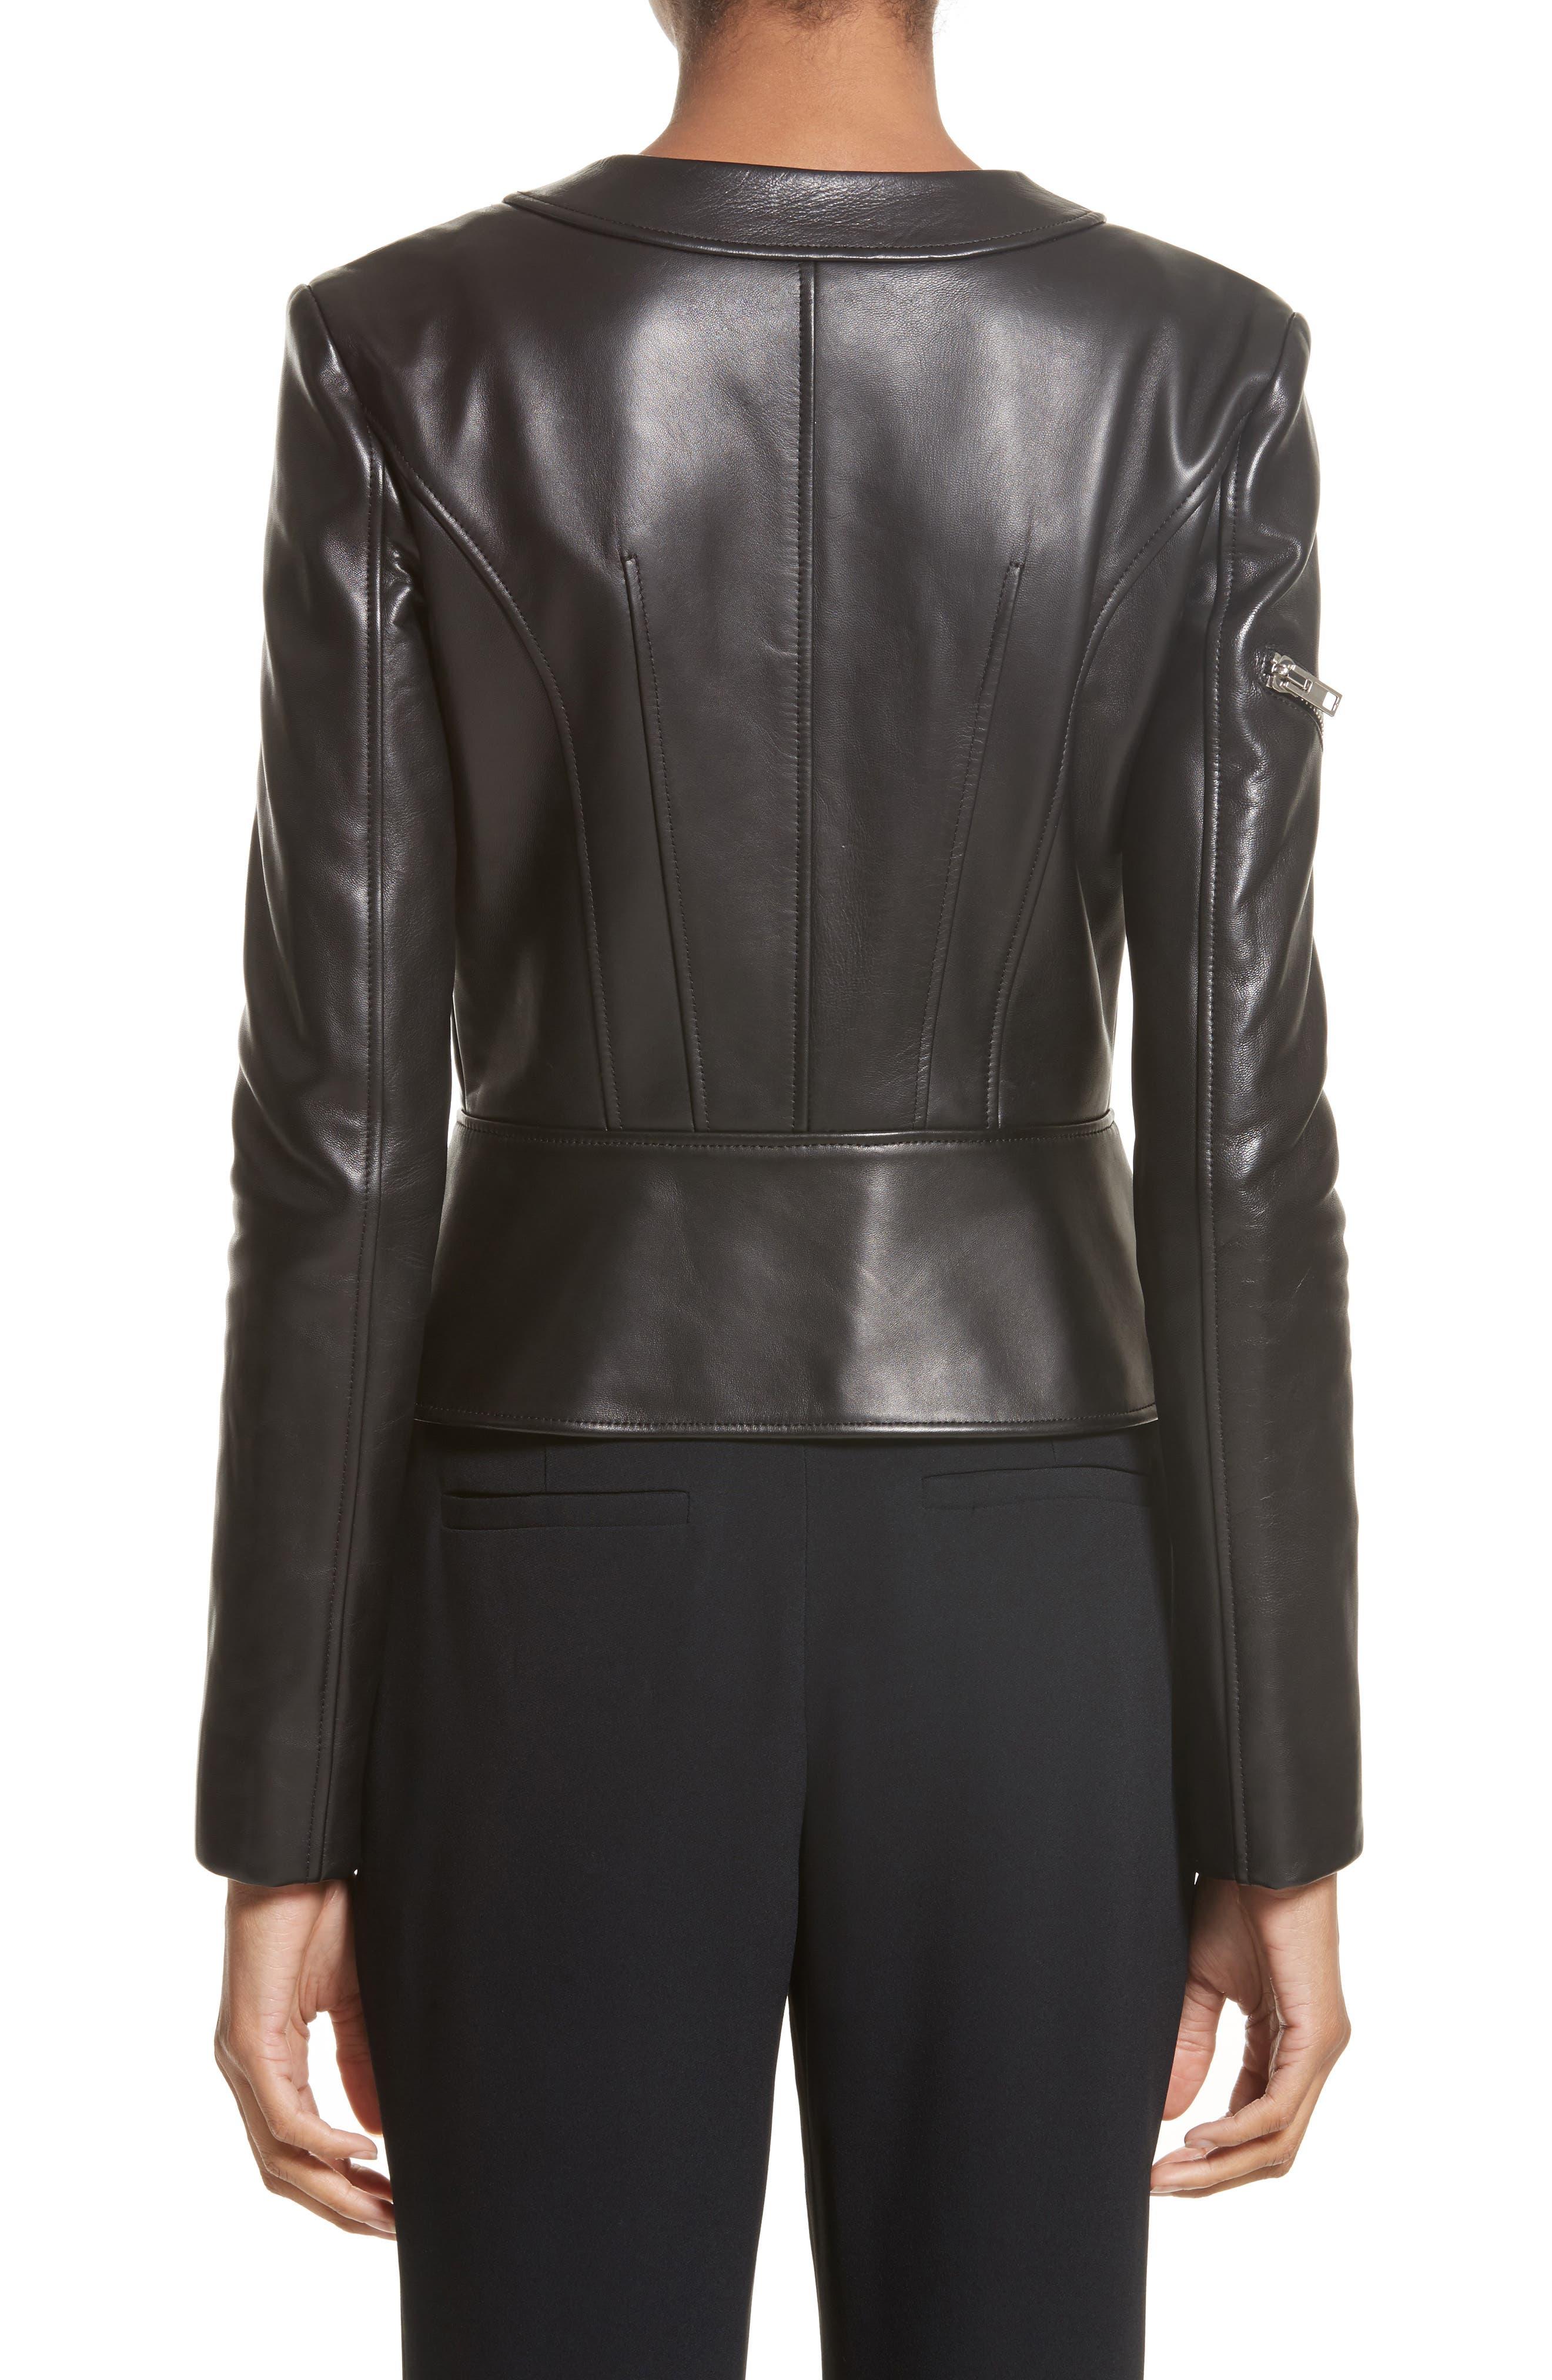 Hook Detail Lambskin Leather Jacket,                             Alternate thumbnail 2, color,                             Black